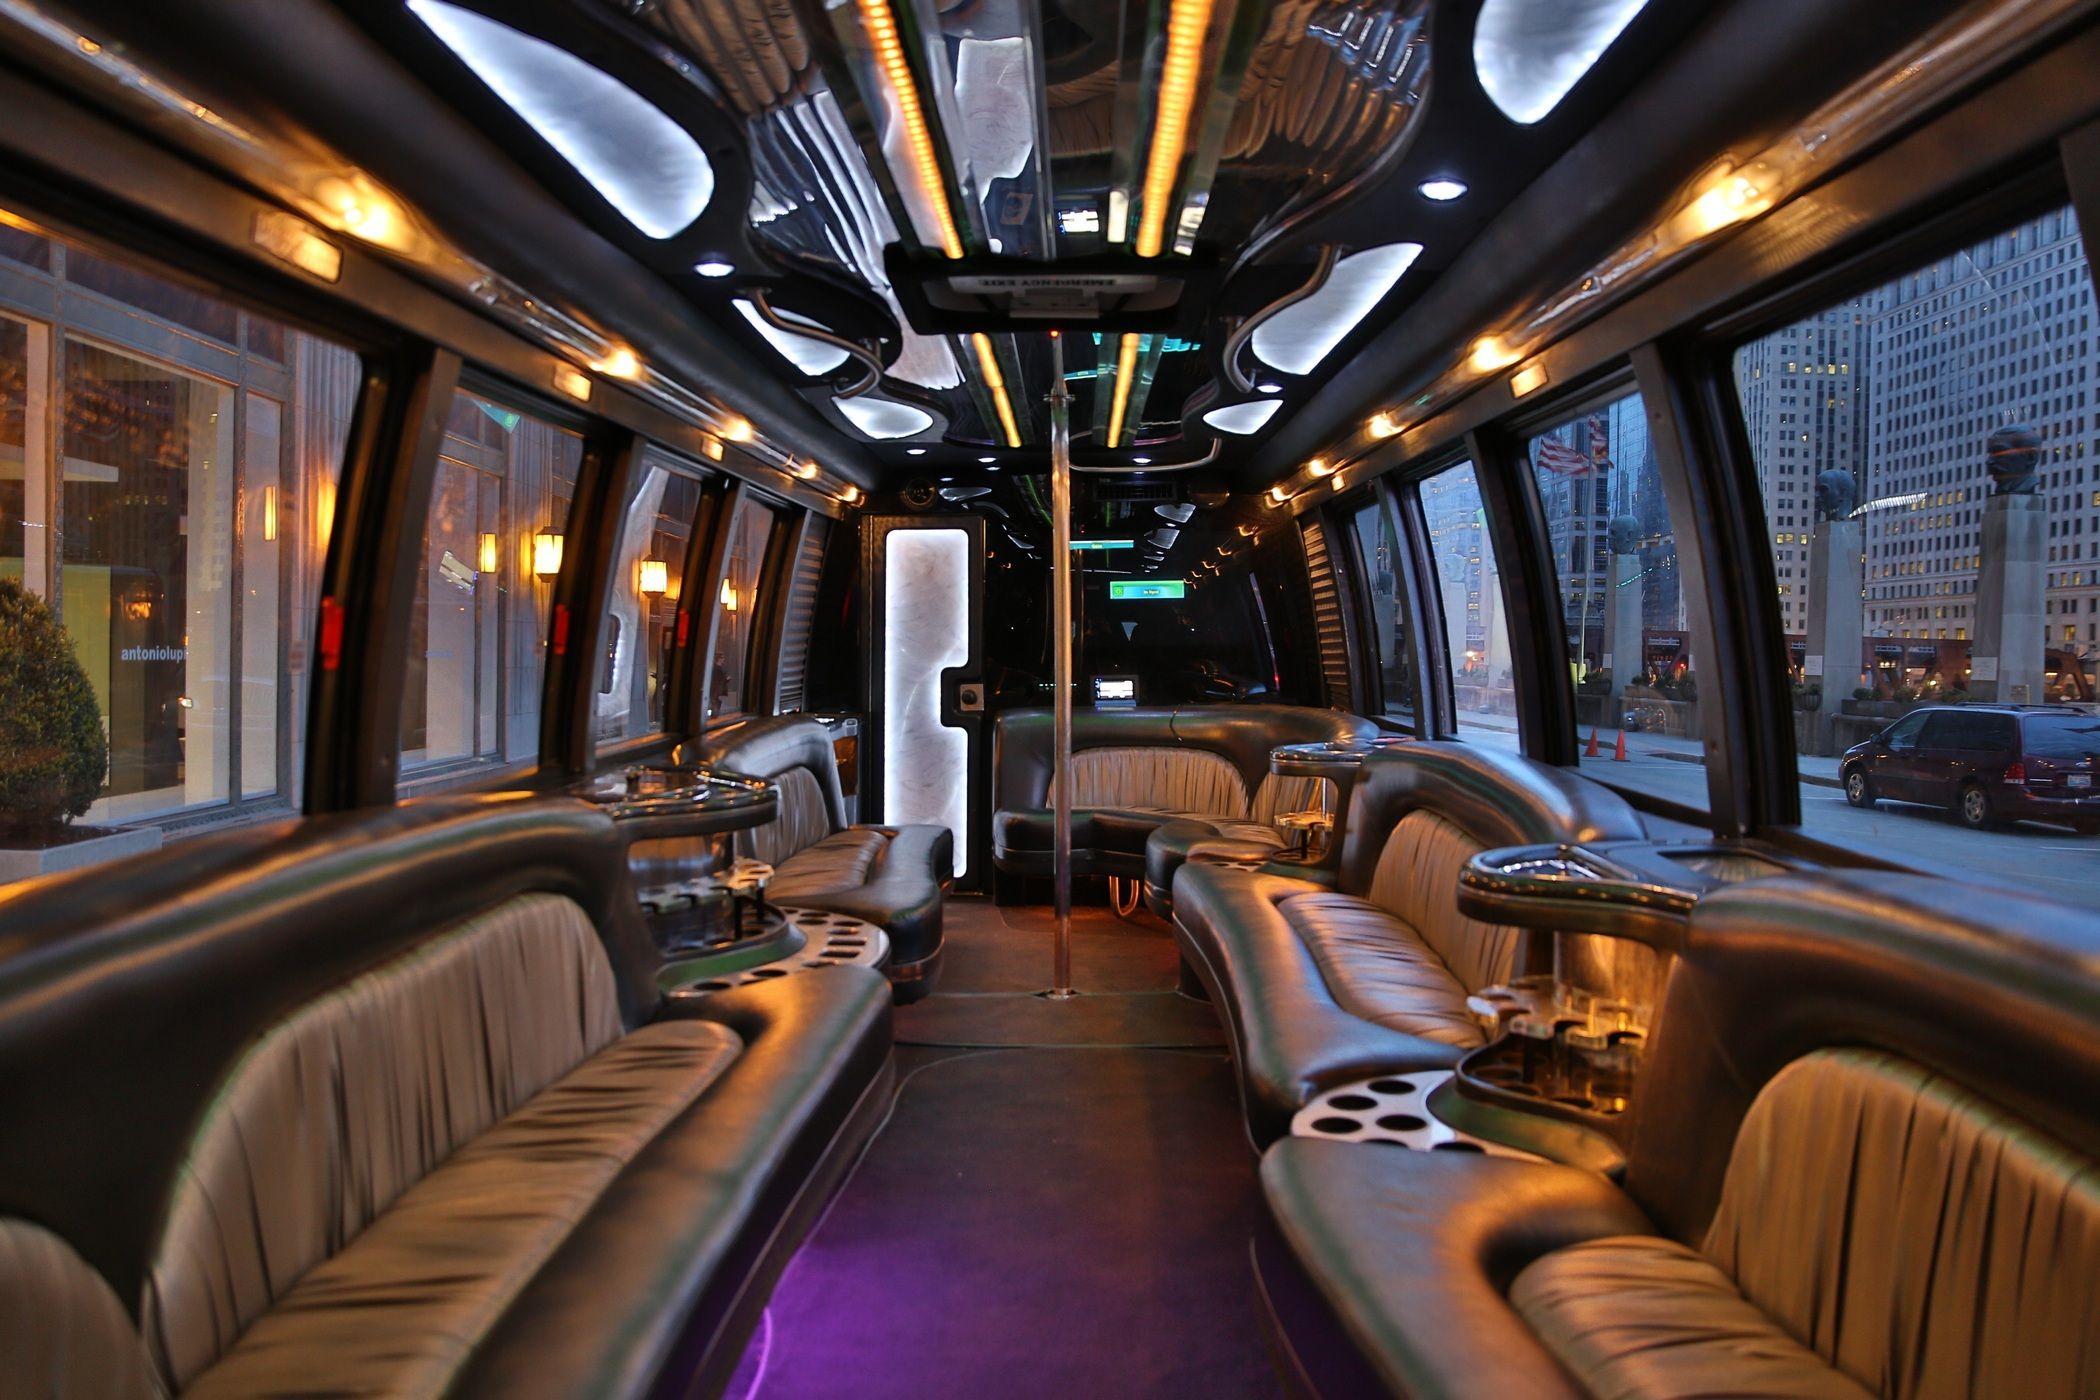 Mini Party Limo Bus to maximum 25 passengers 列車